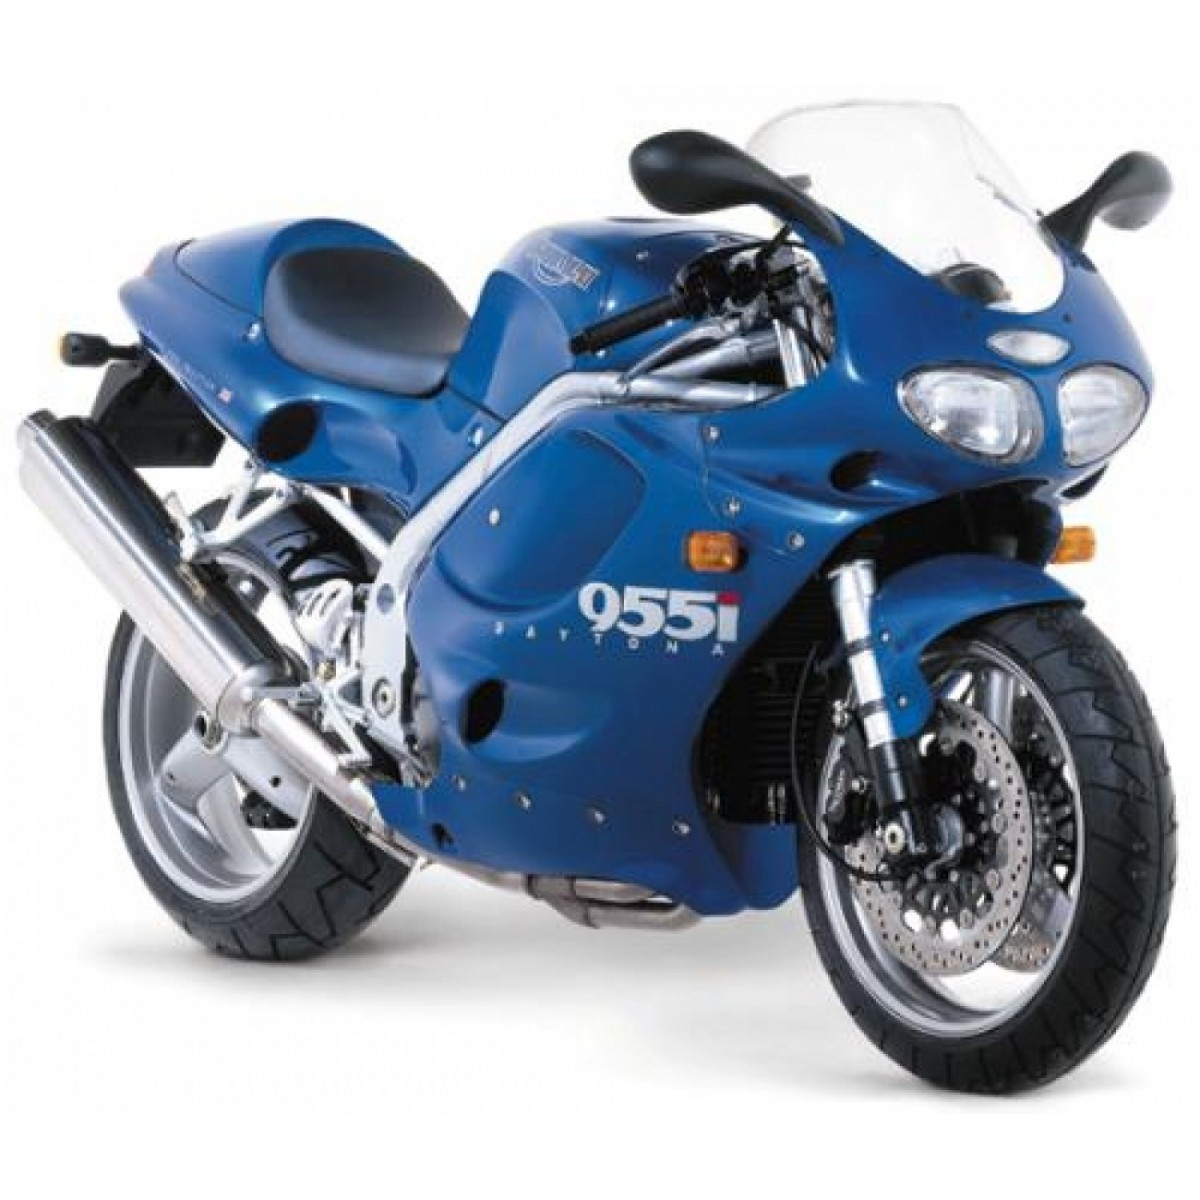 Kit Adesivos Triumph Daytona 955i Azul E Prata Decalx